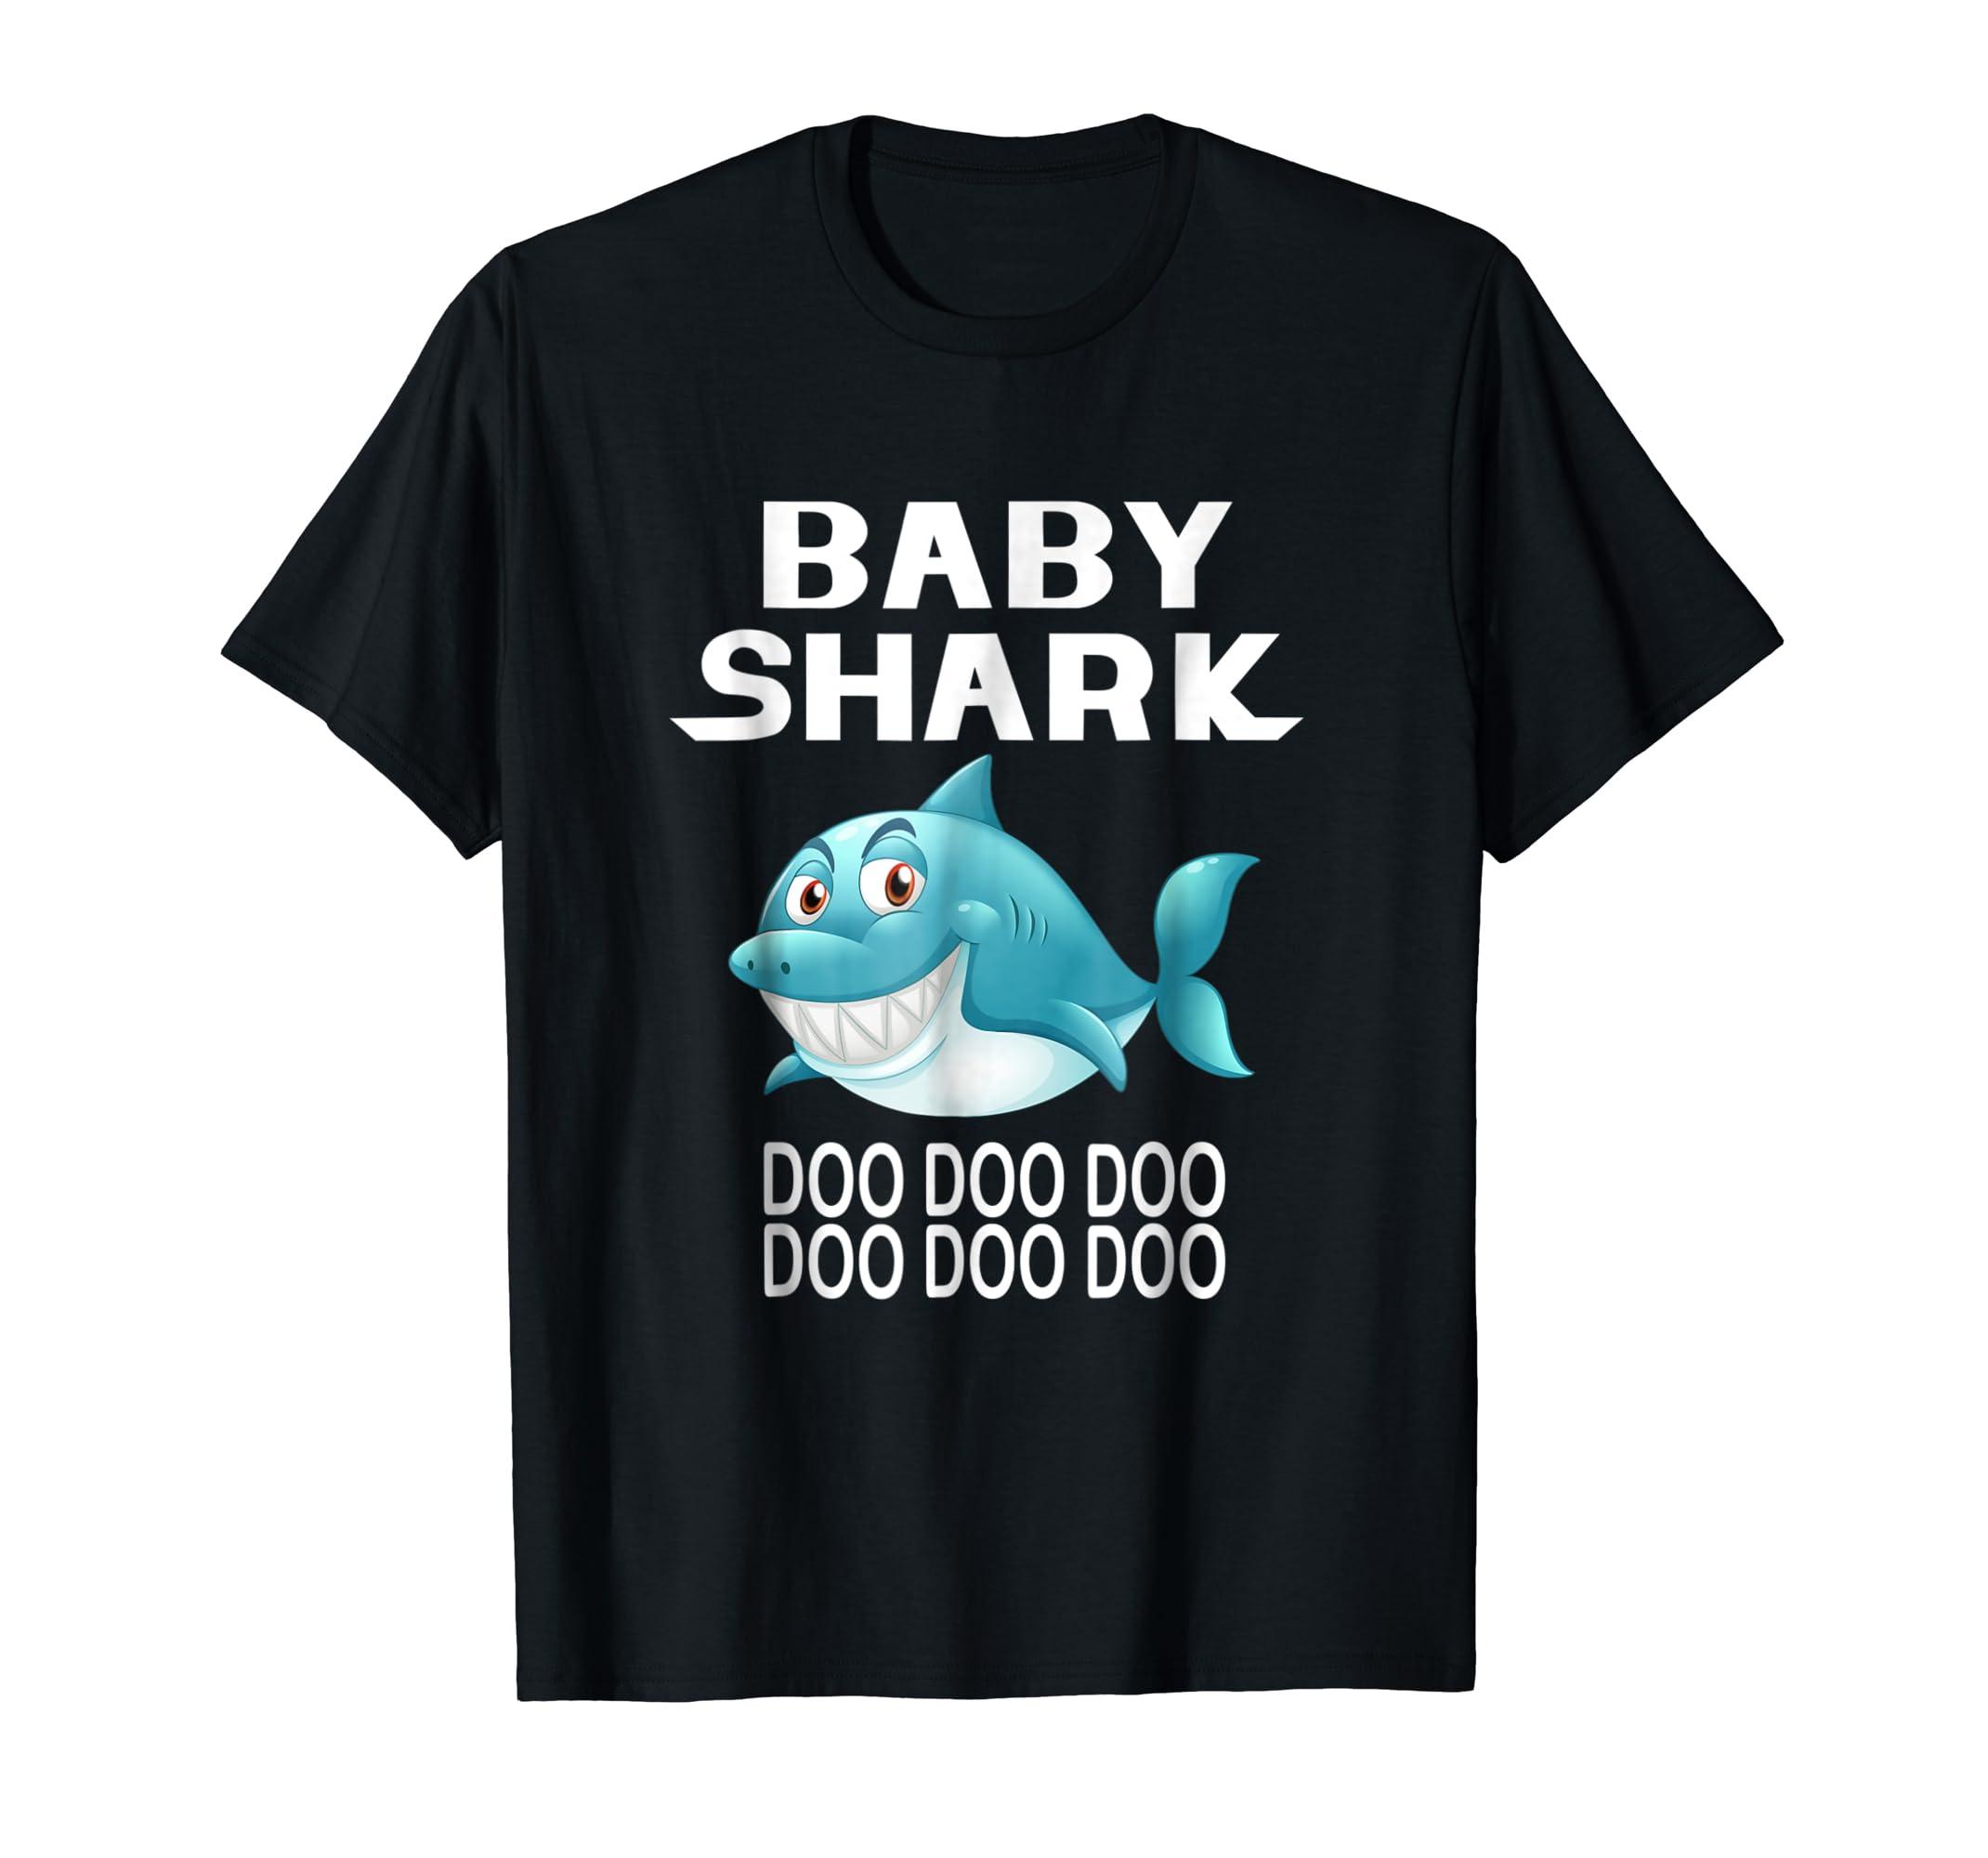 BABY SHARK SHIRT-Awarplus